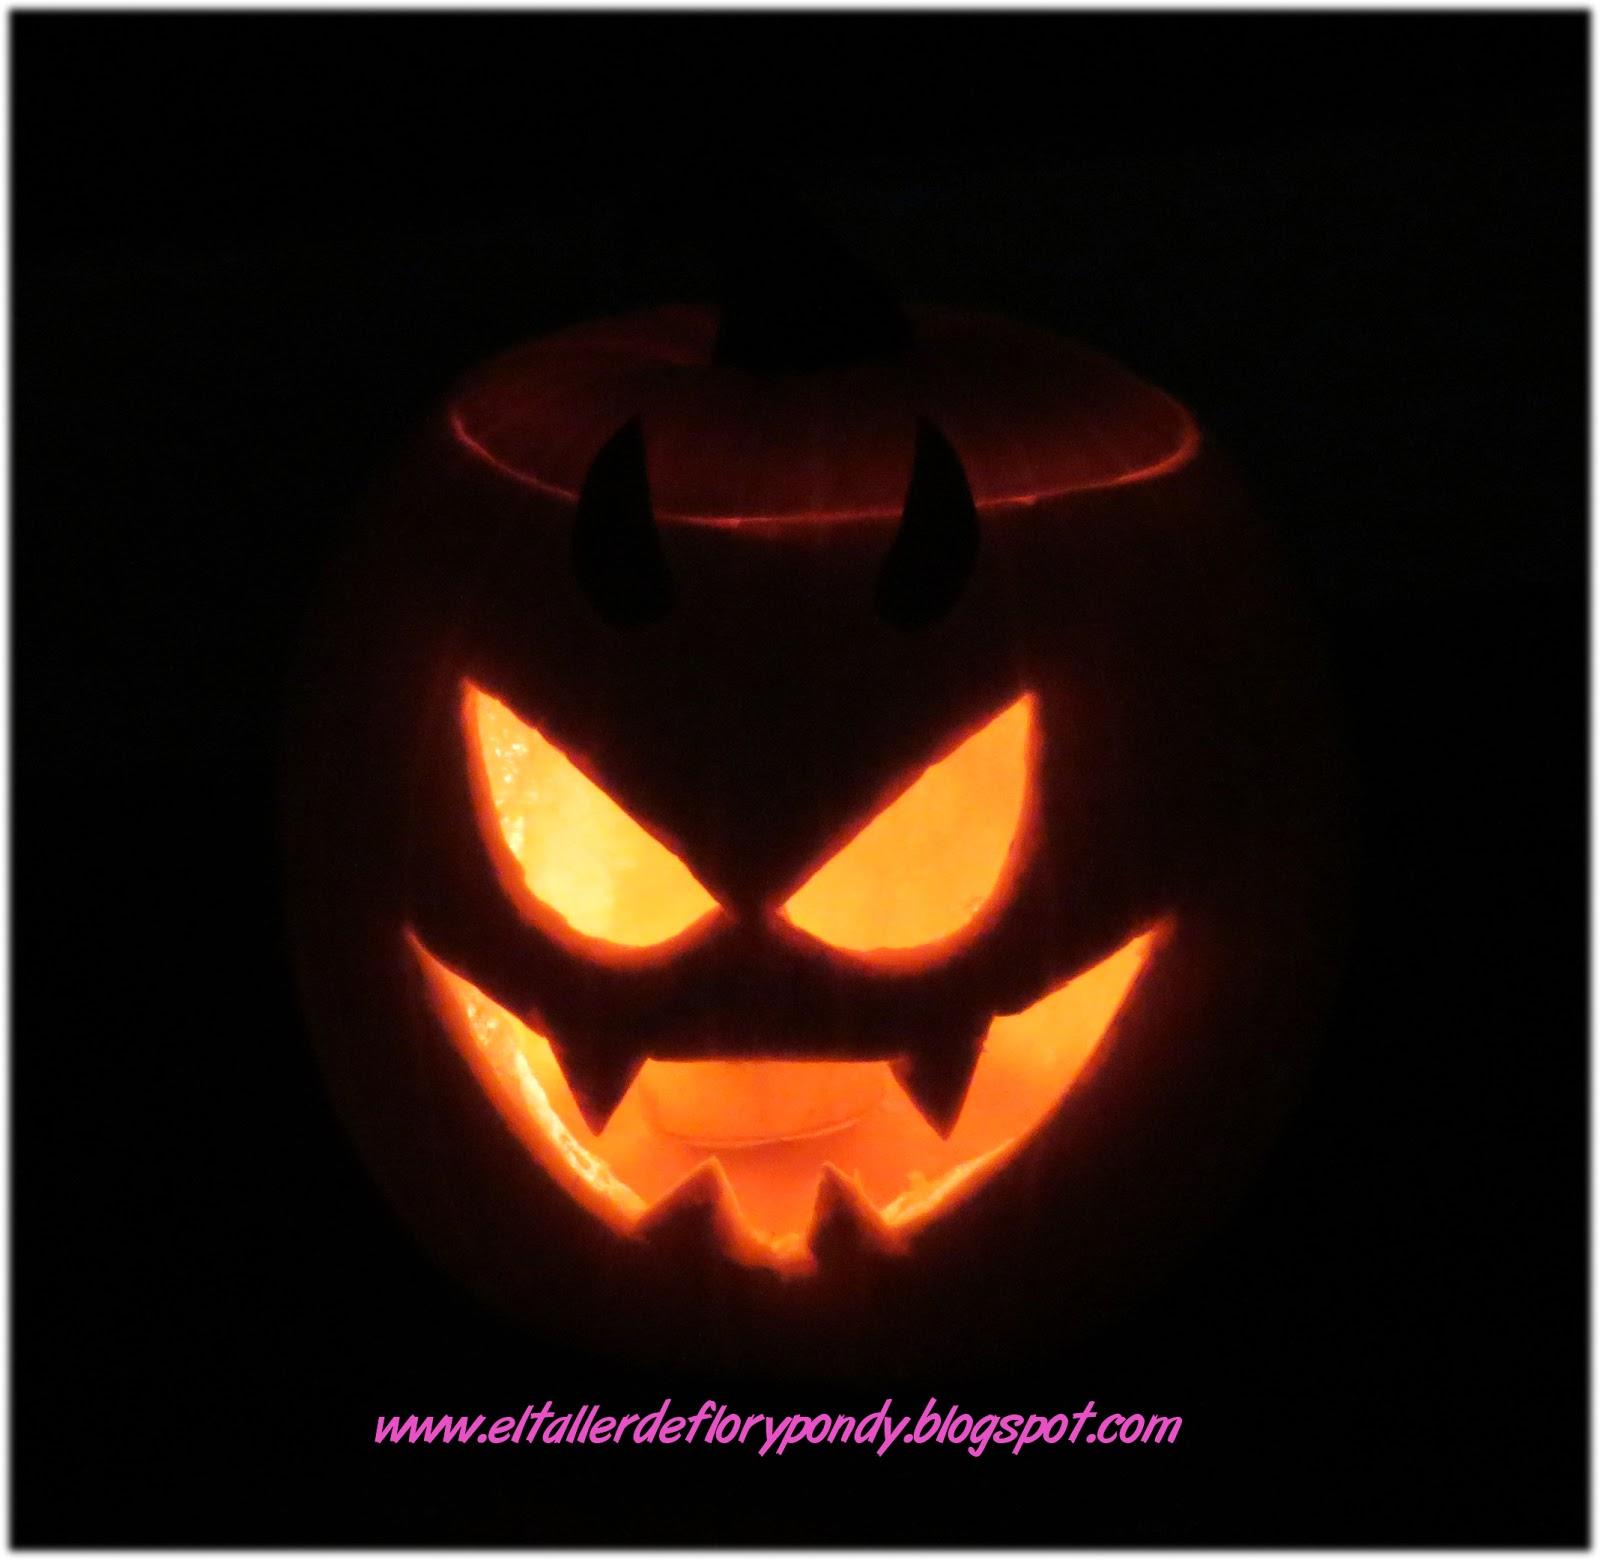 El taller de flory pondy calabaza para halloween - Halloween hipercor ...